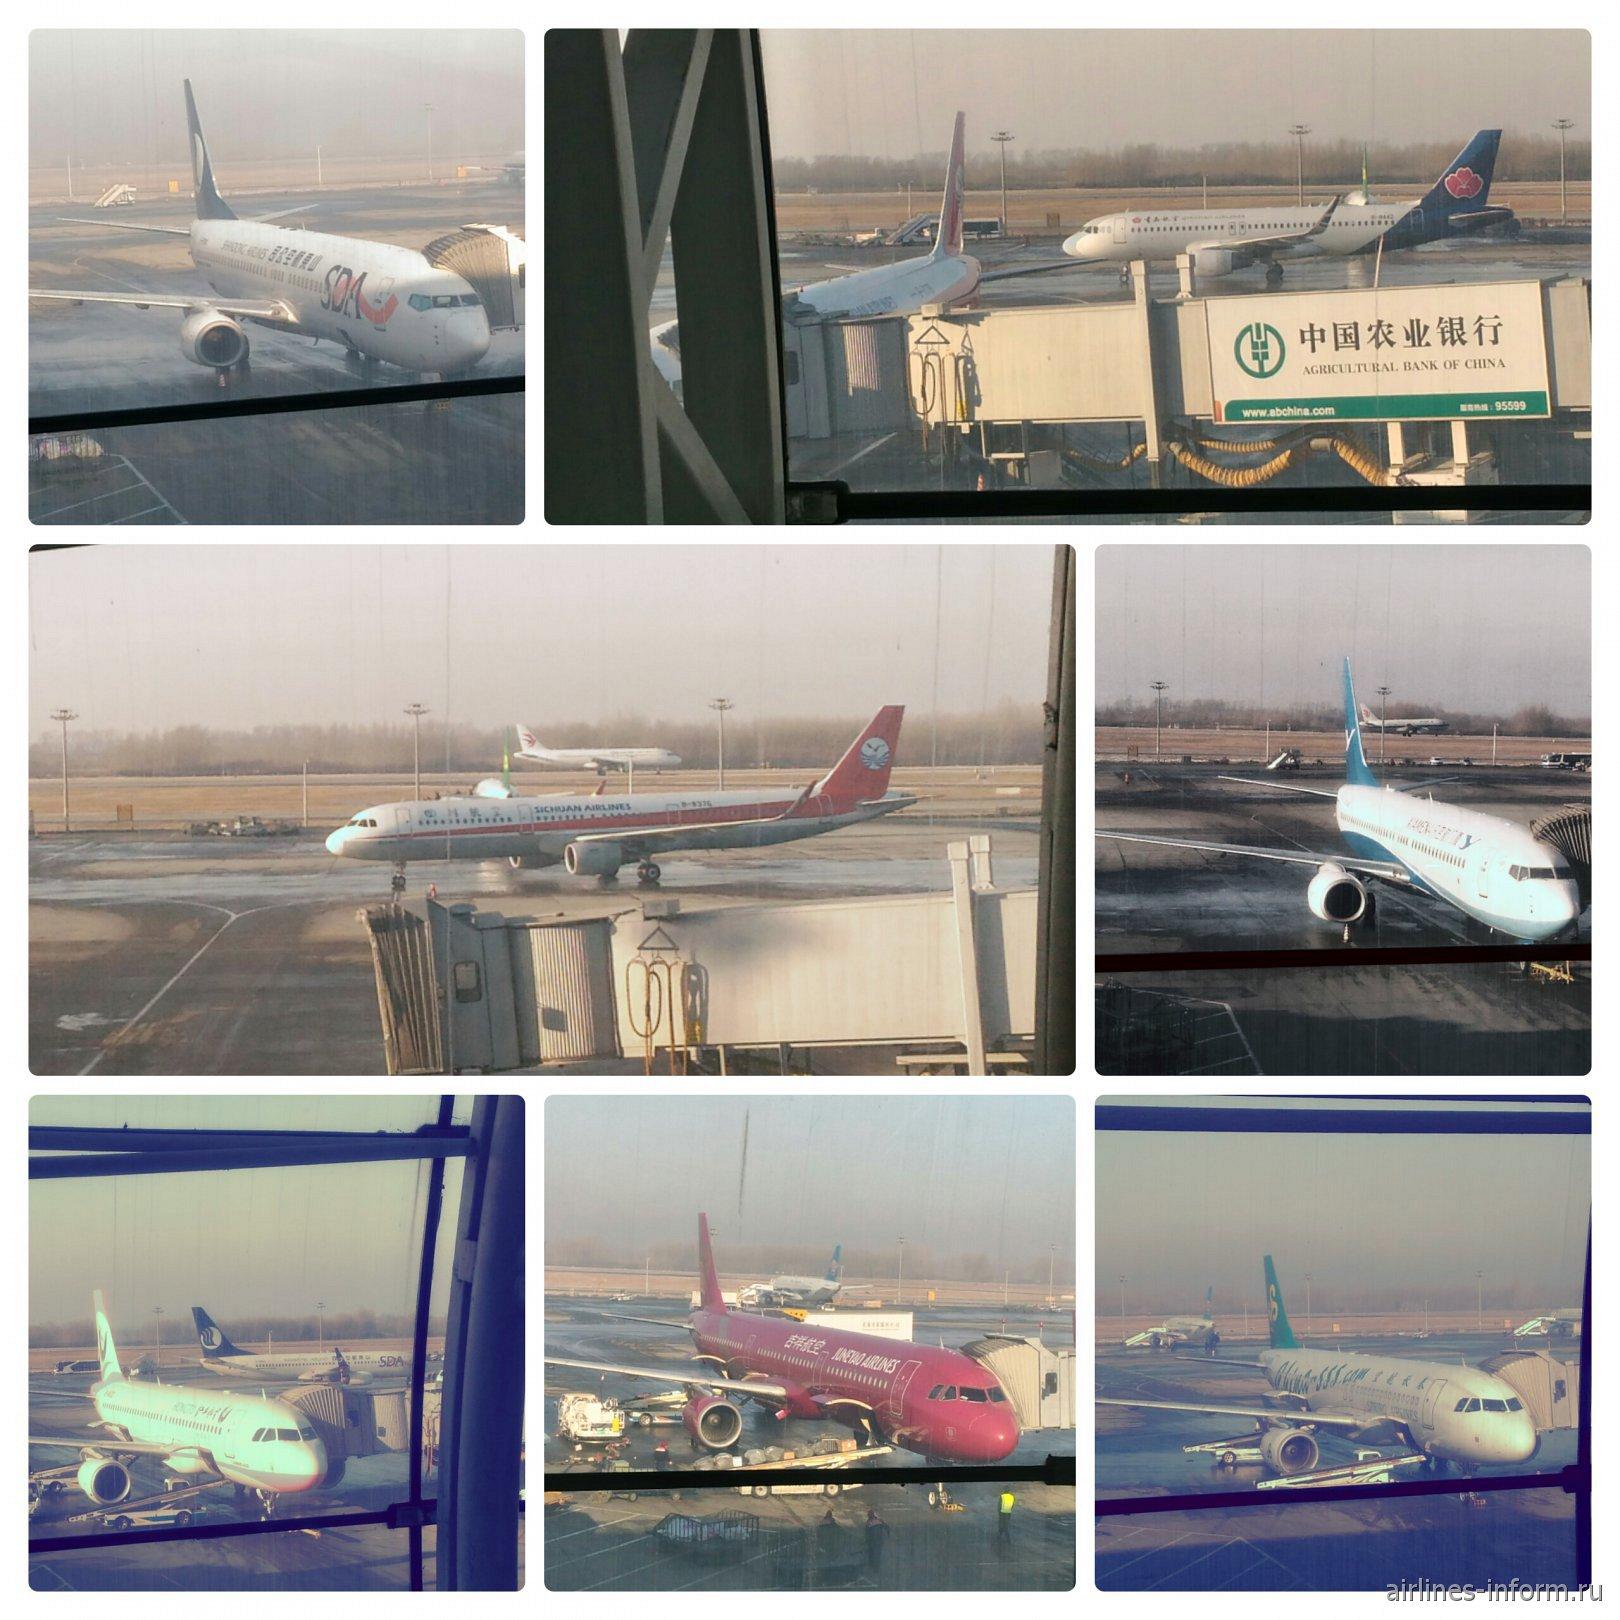 слева направо, сверху вниз: B737 Shandong Airlines, A320 Qingdao Airlines, A321 Sichuan Airlines, B-737 Xiamen Air, A320 Hongtu Airlines, A321 Juneyao Airlines, A320 Spring Airlines